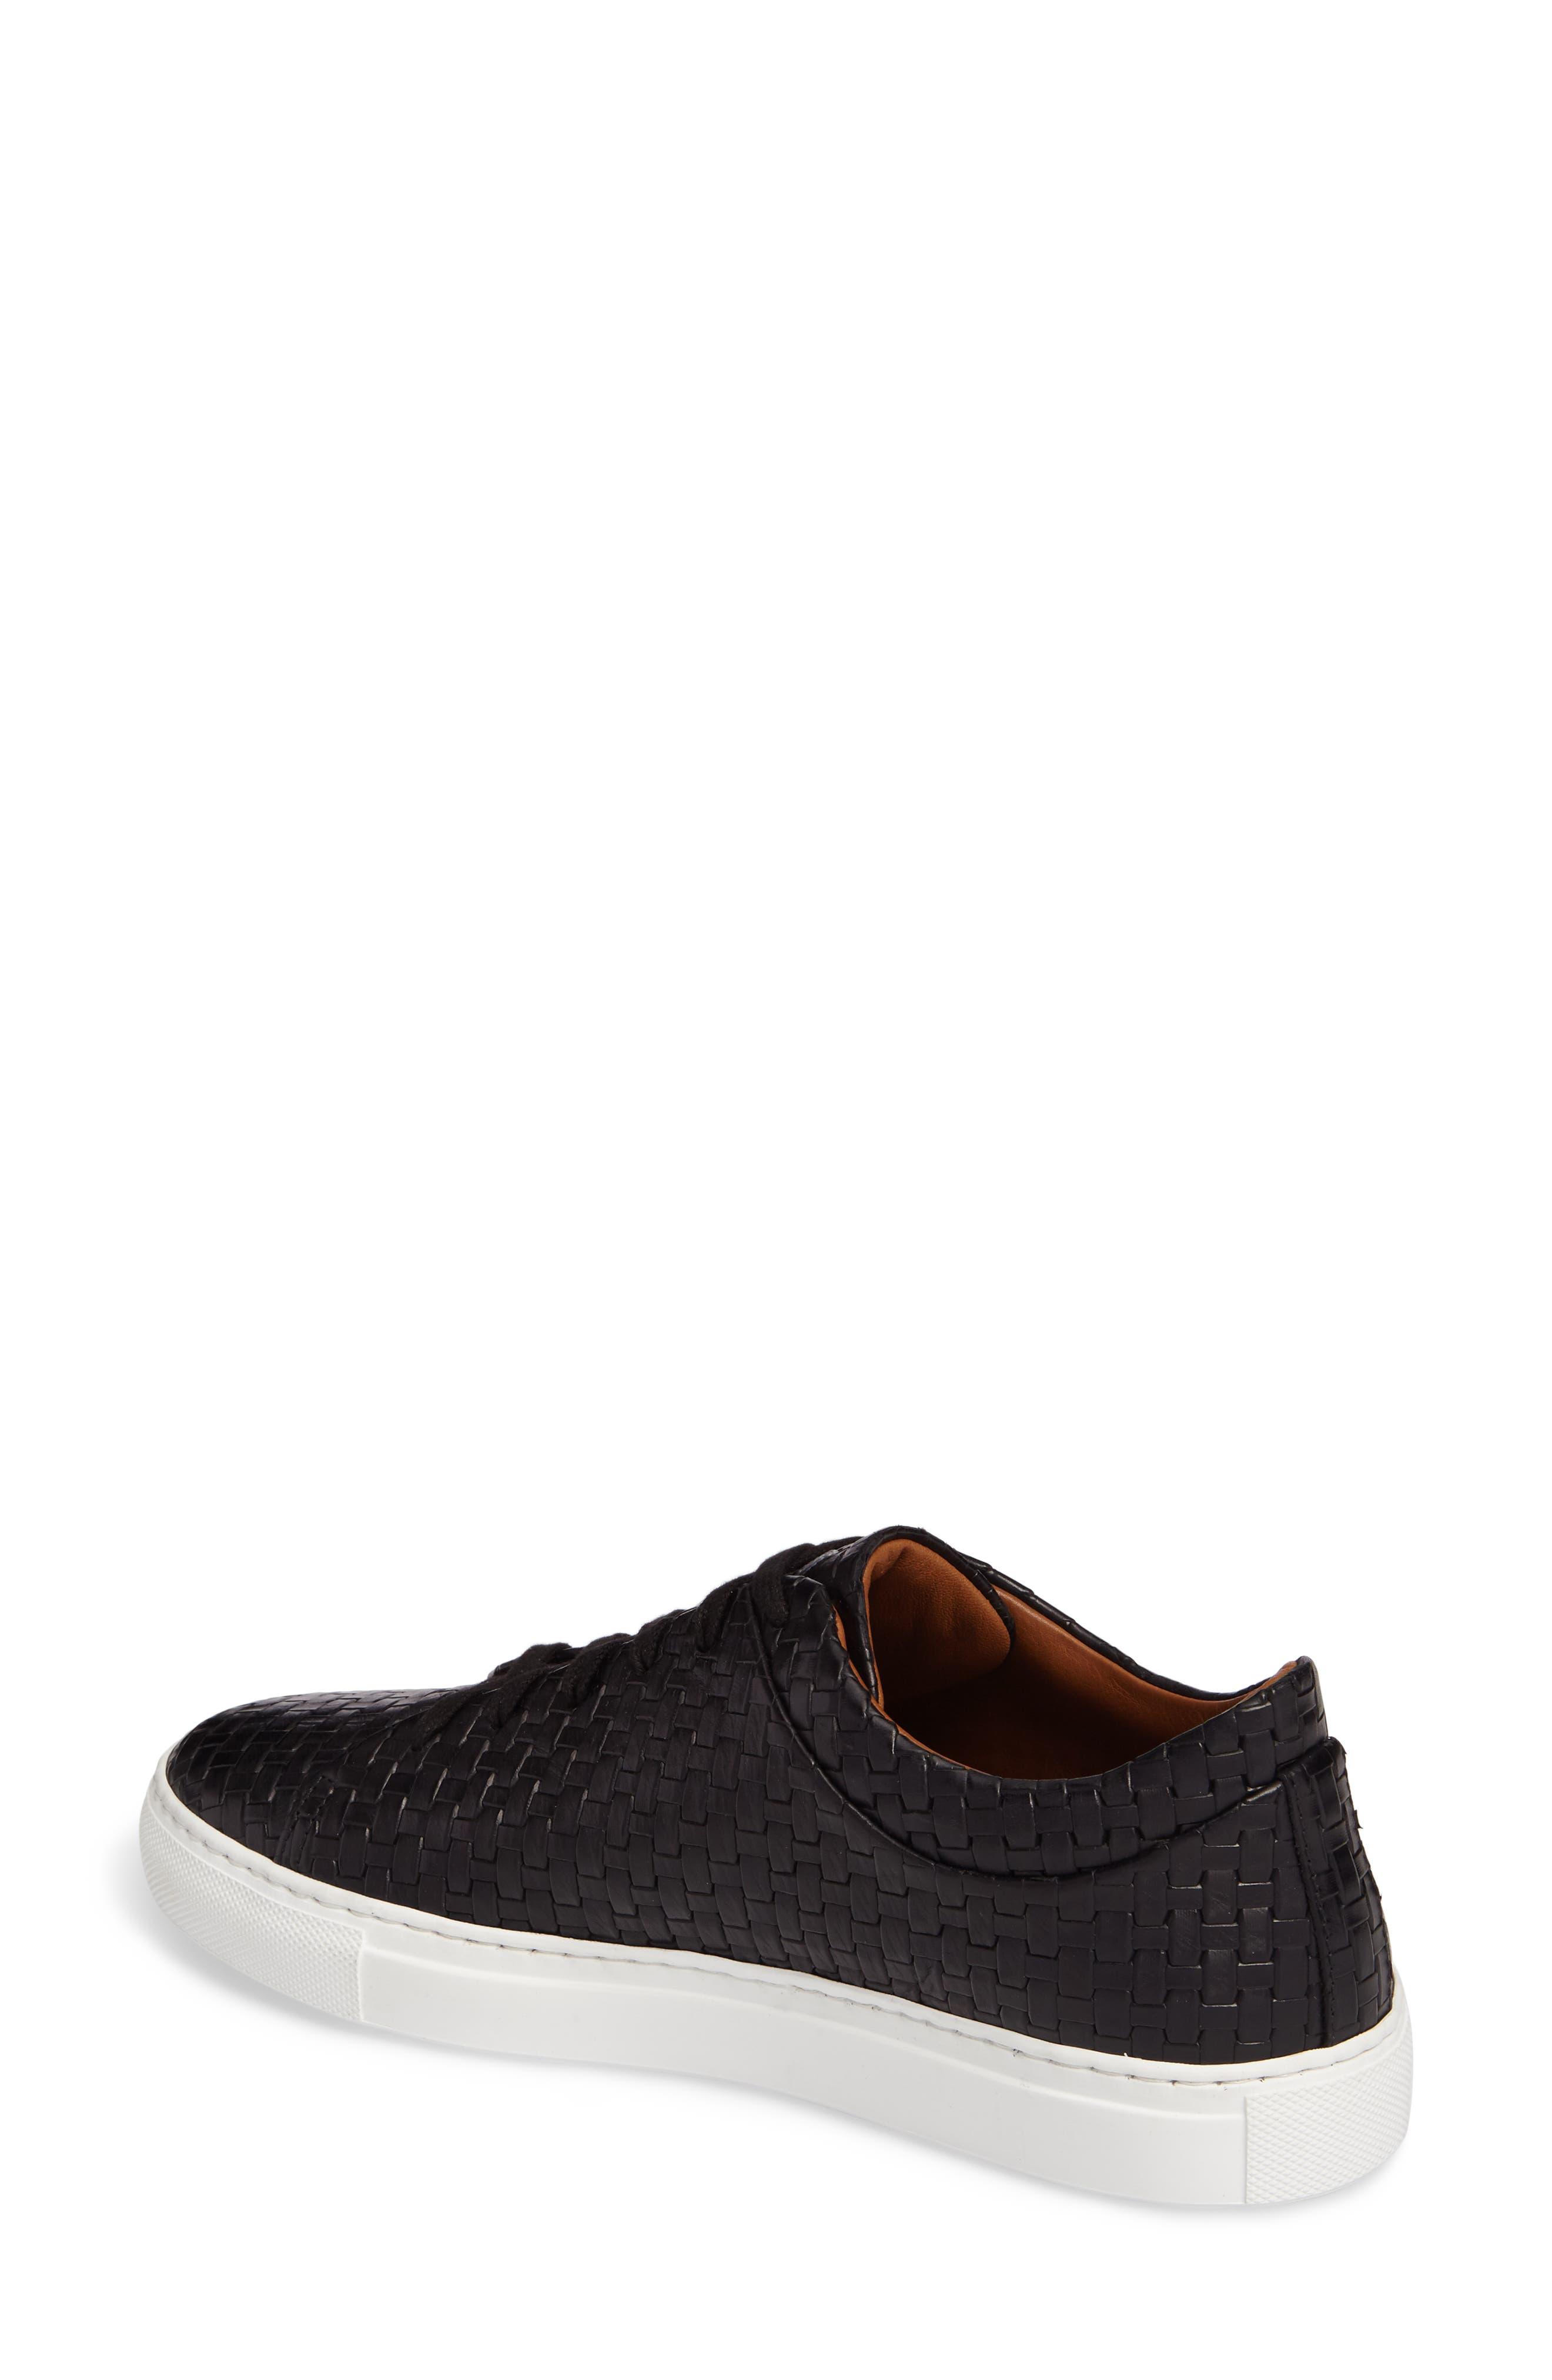 Avery Weatherproof Sneaker,                             Alternate thumbnail 2, color,                             Black